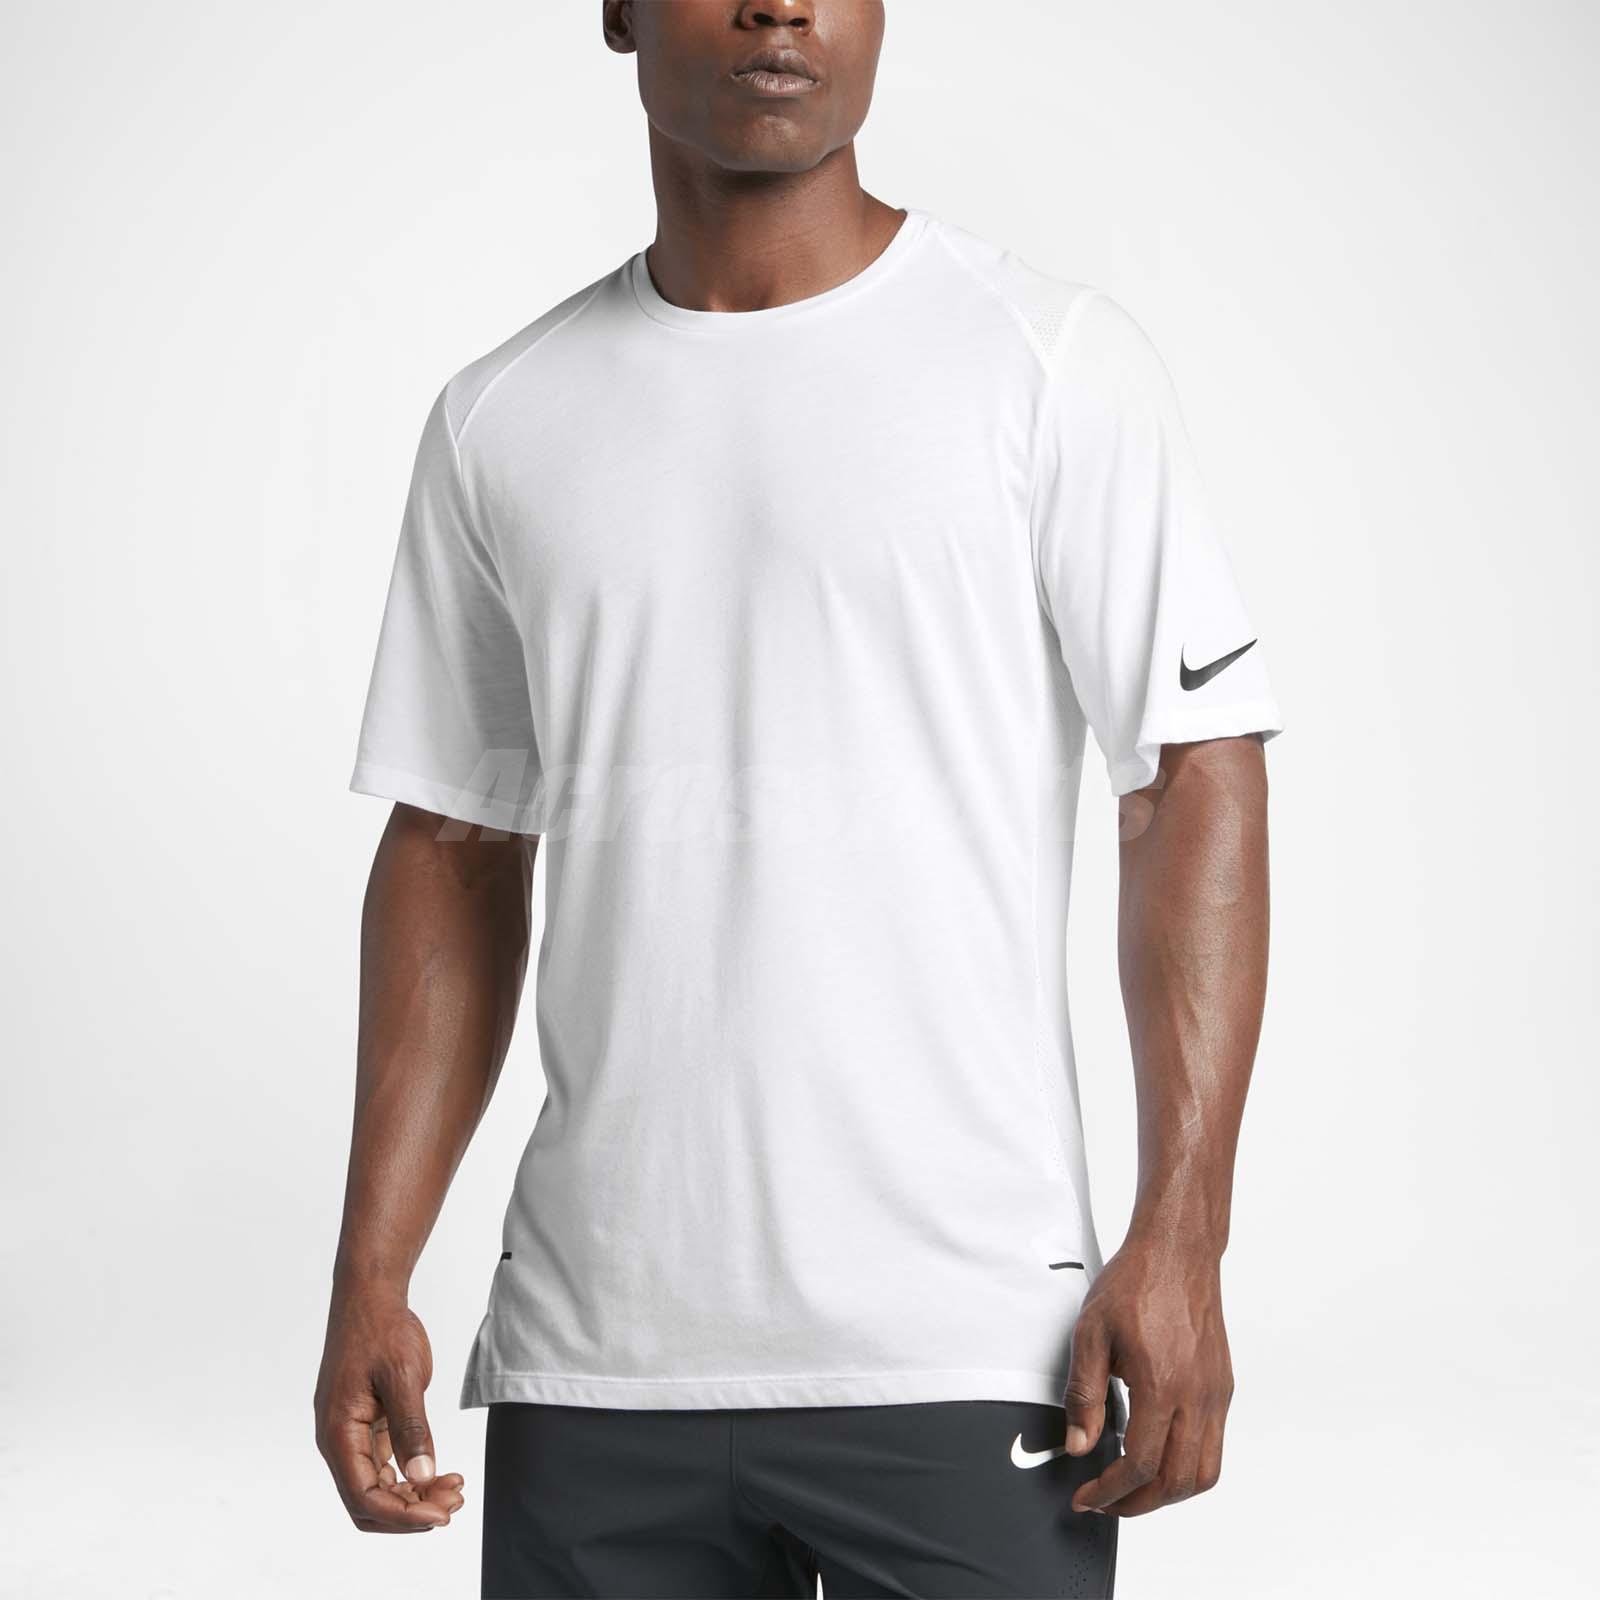 49cba261c030 Details about Nike Men Breathe Top Short Sleeve Elite Tee Hoops T-Shirt  Basketball 830950-100